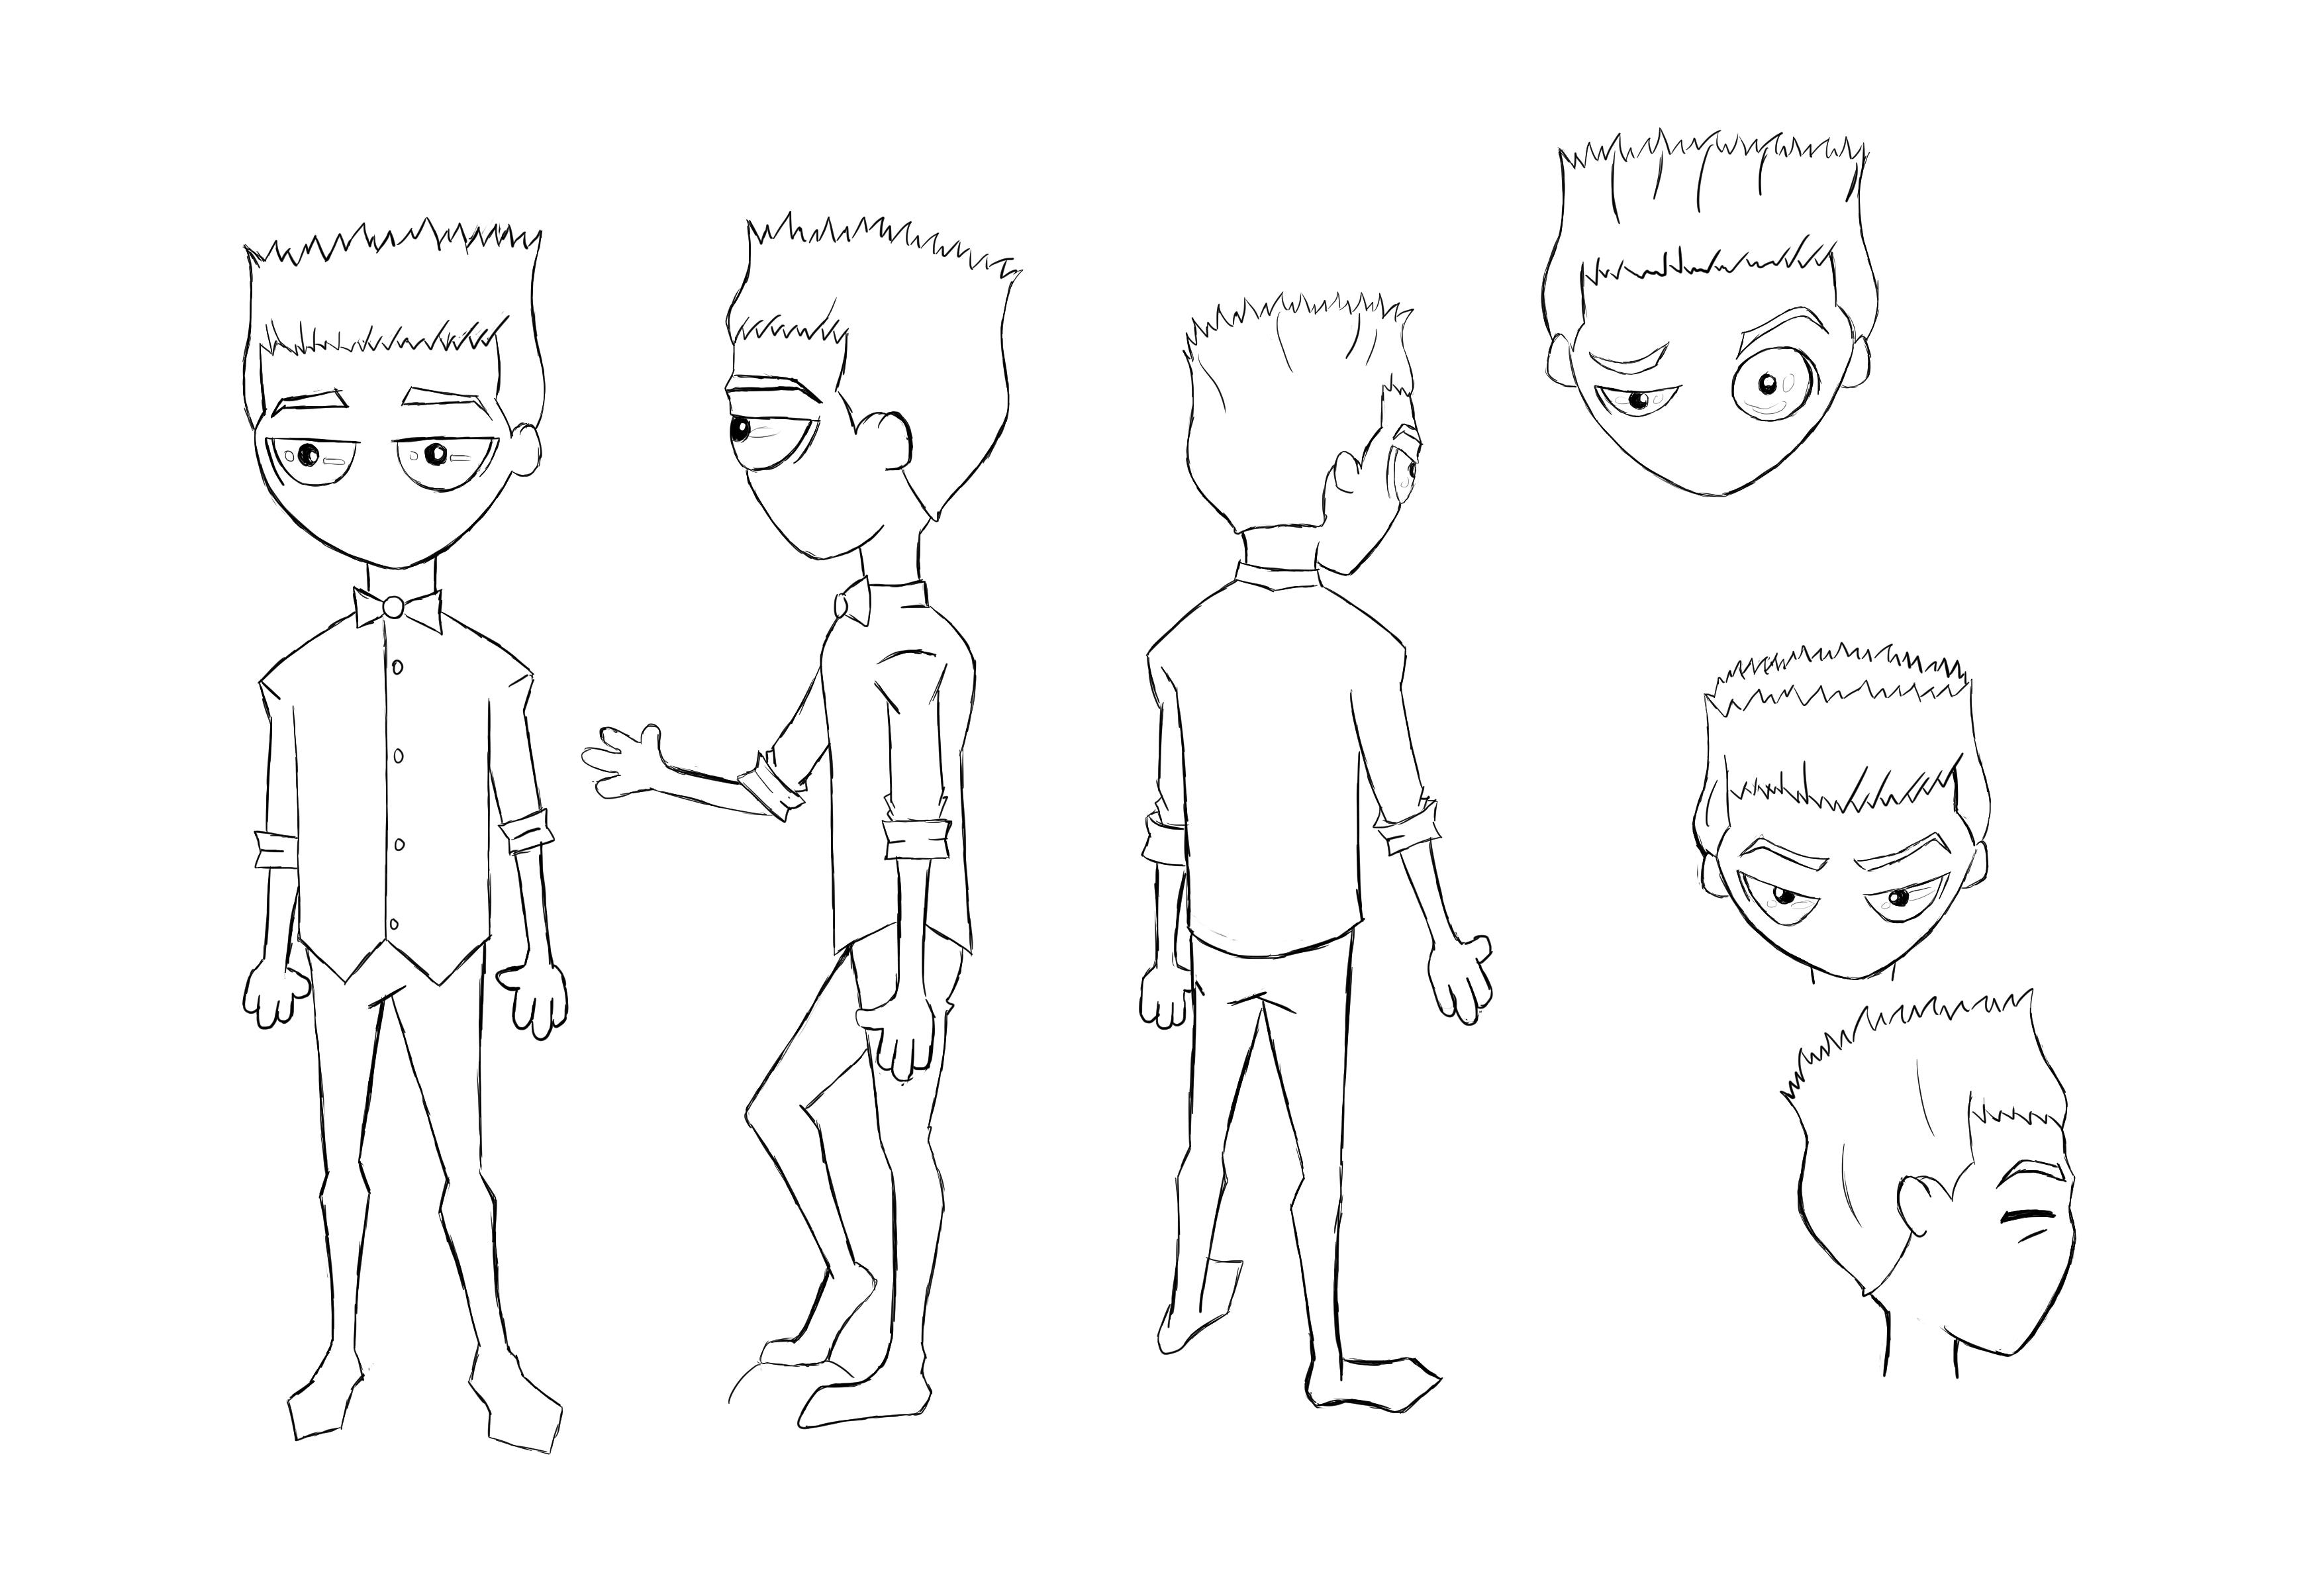 Character Design #1 (Dong_Jeffrey) by jdremix